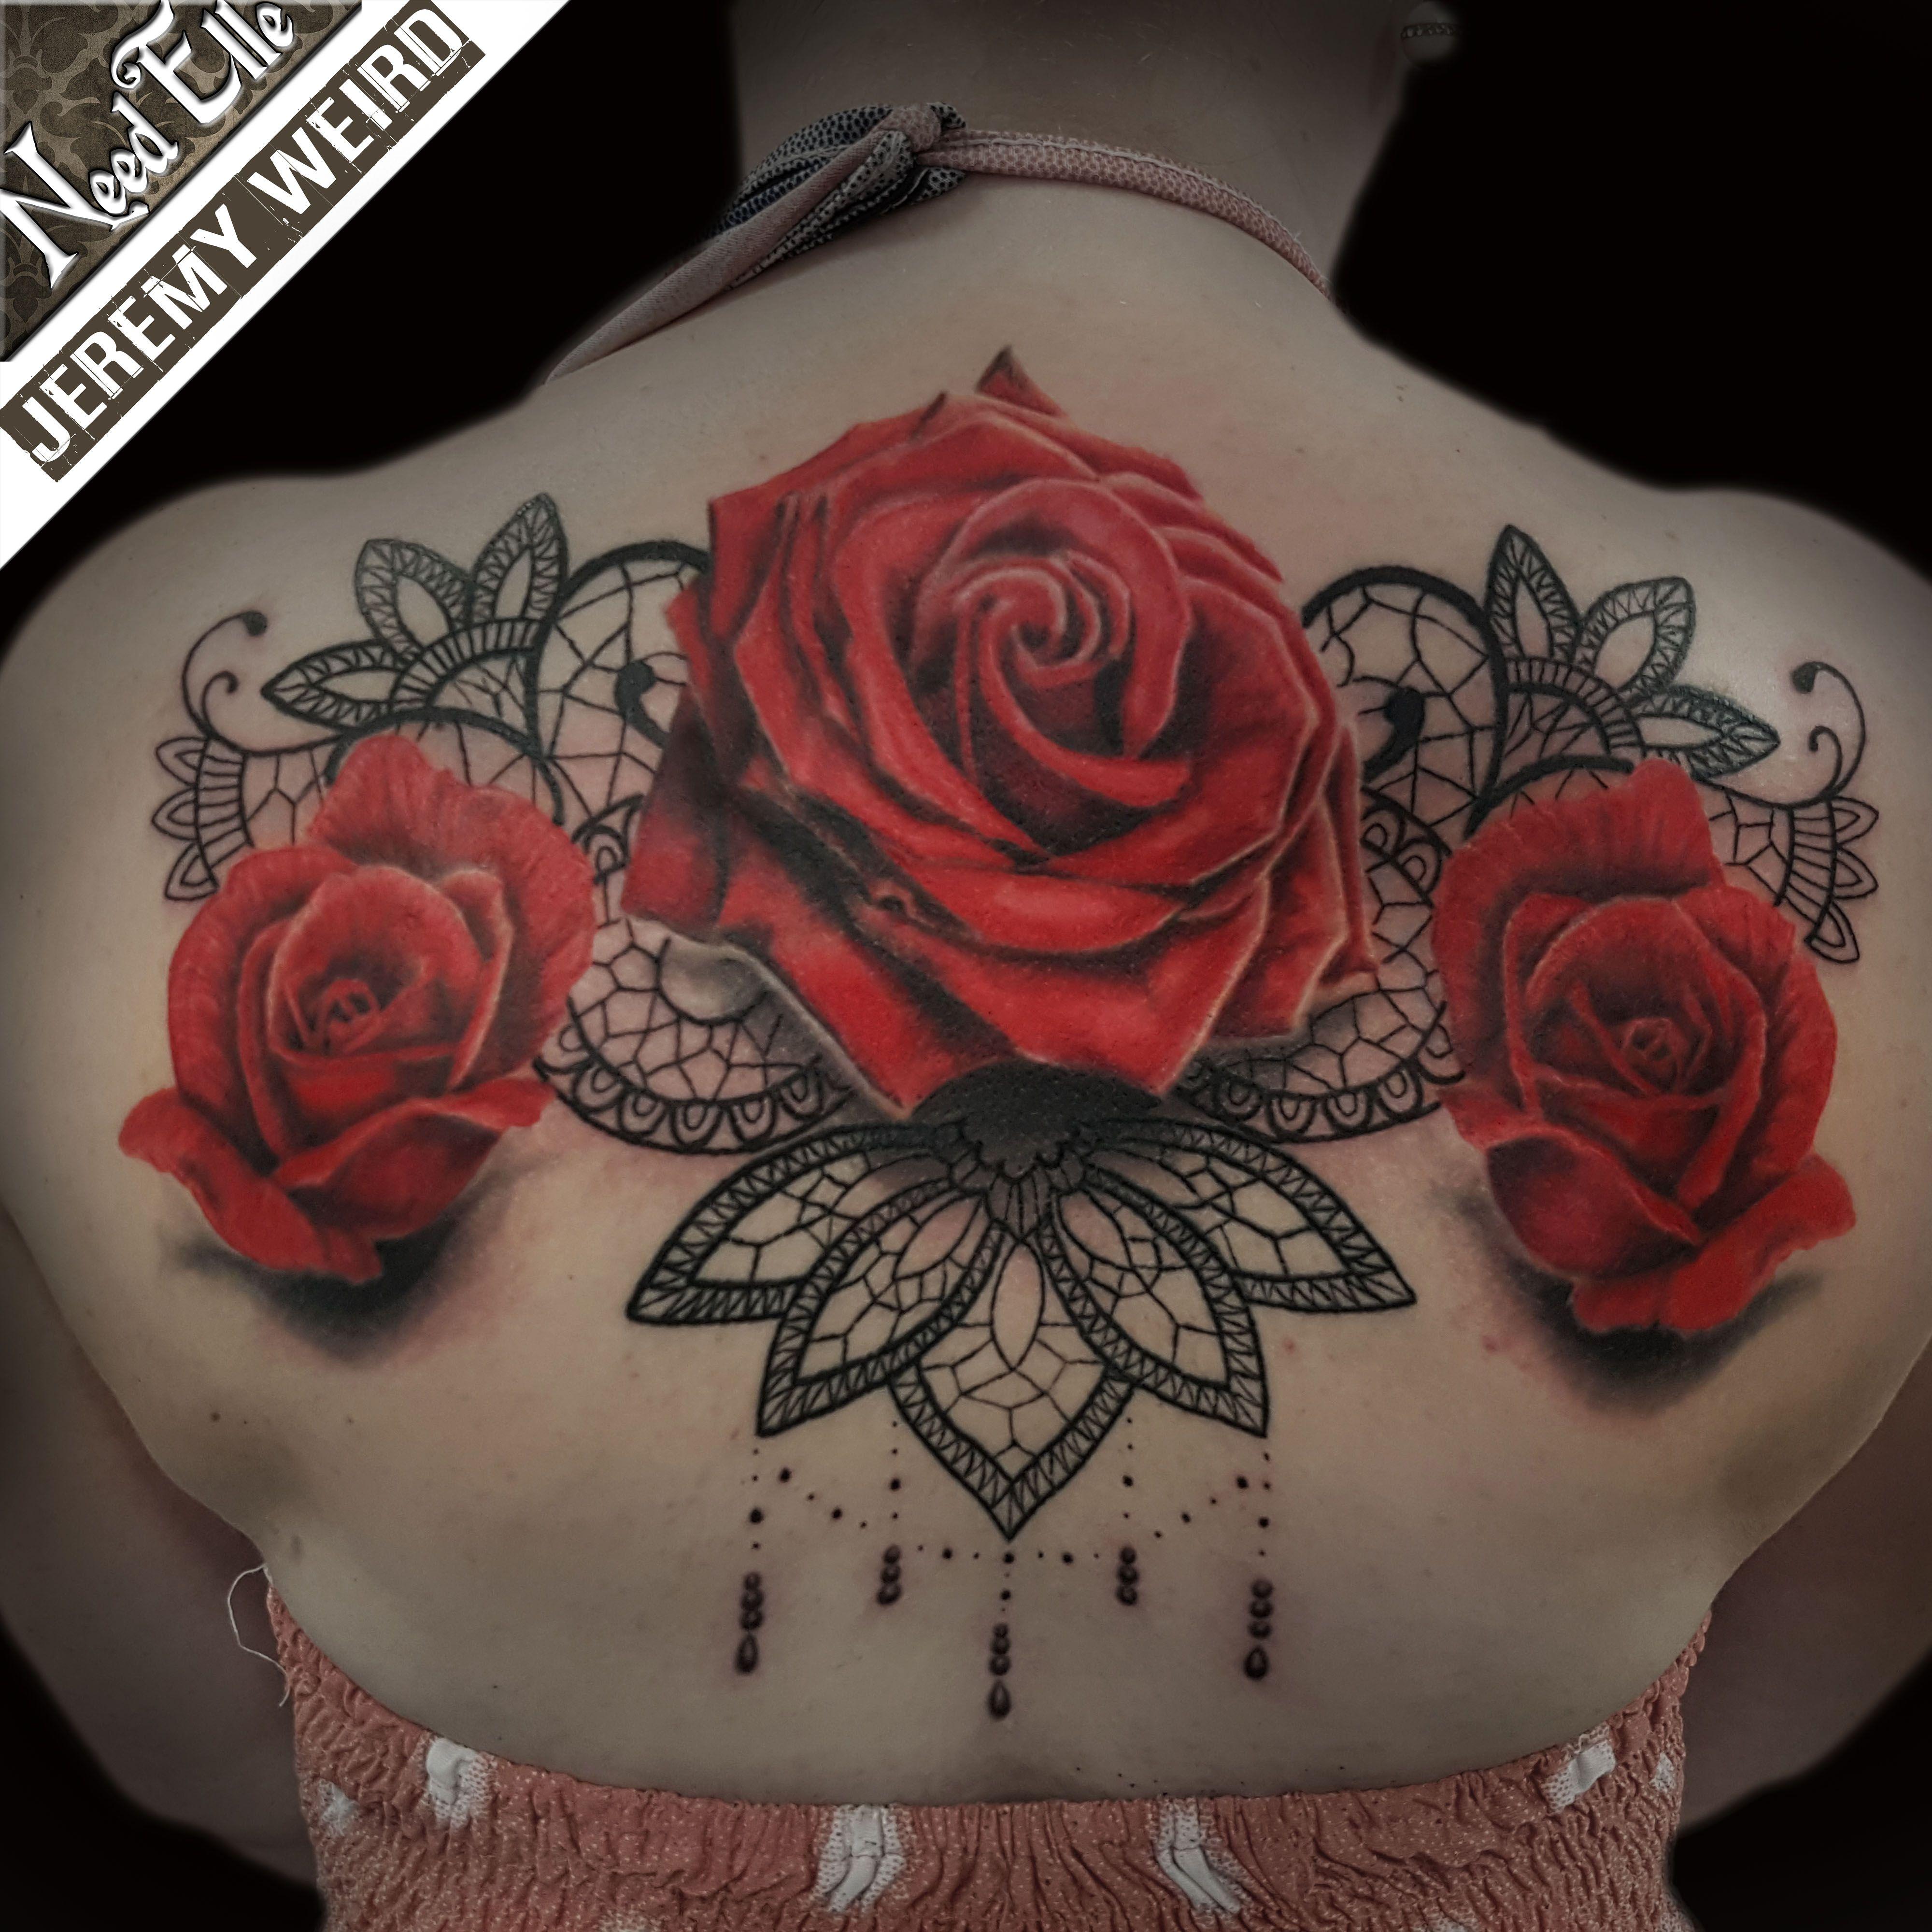 Epingle Sur Tattoos By Jeremy Weird Tatouages Par Jeremy Weird